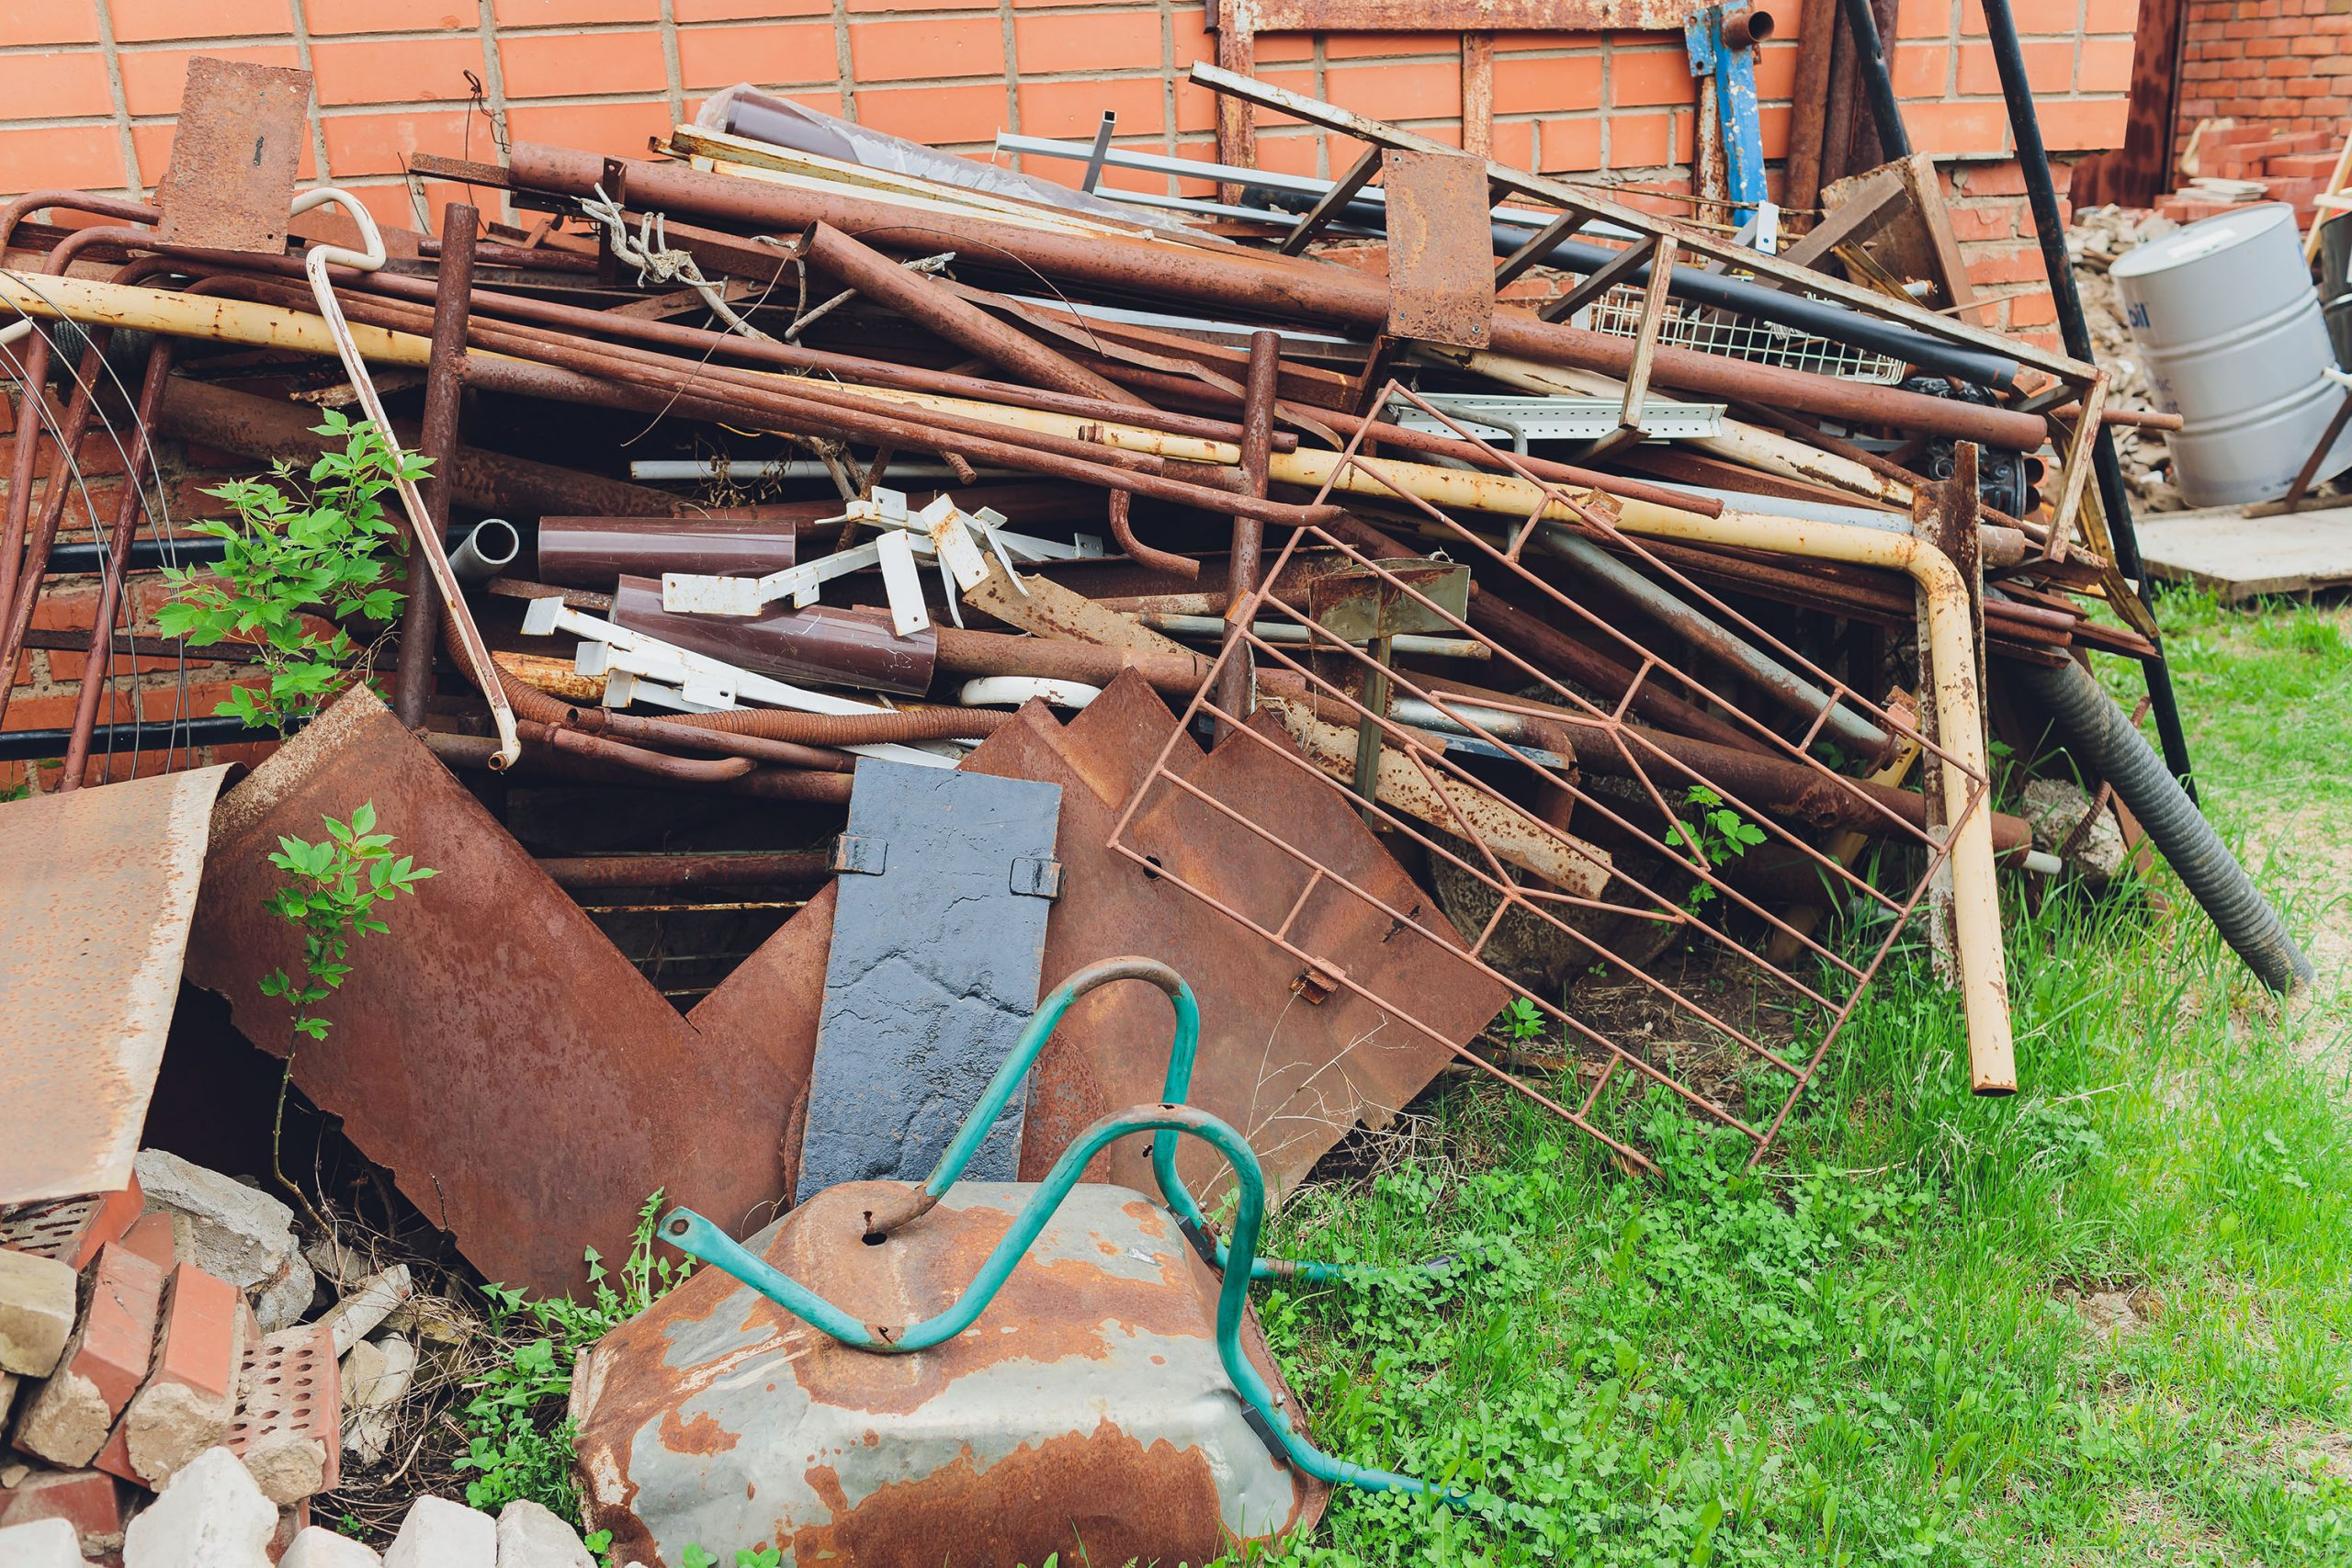 junk haul away